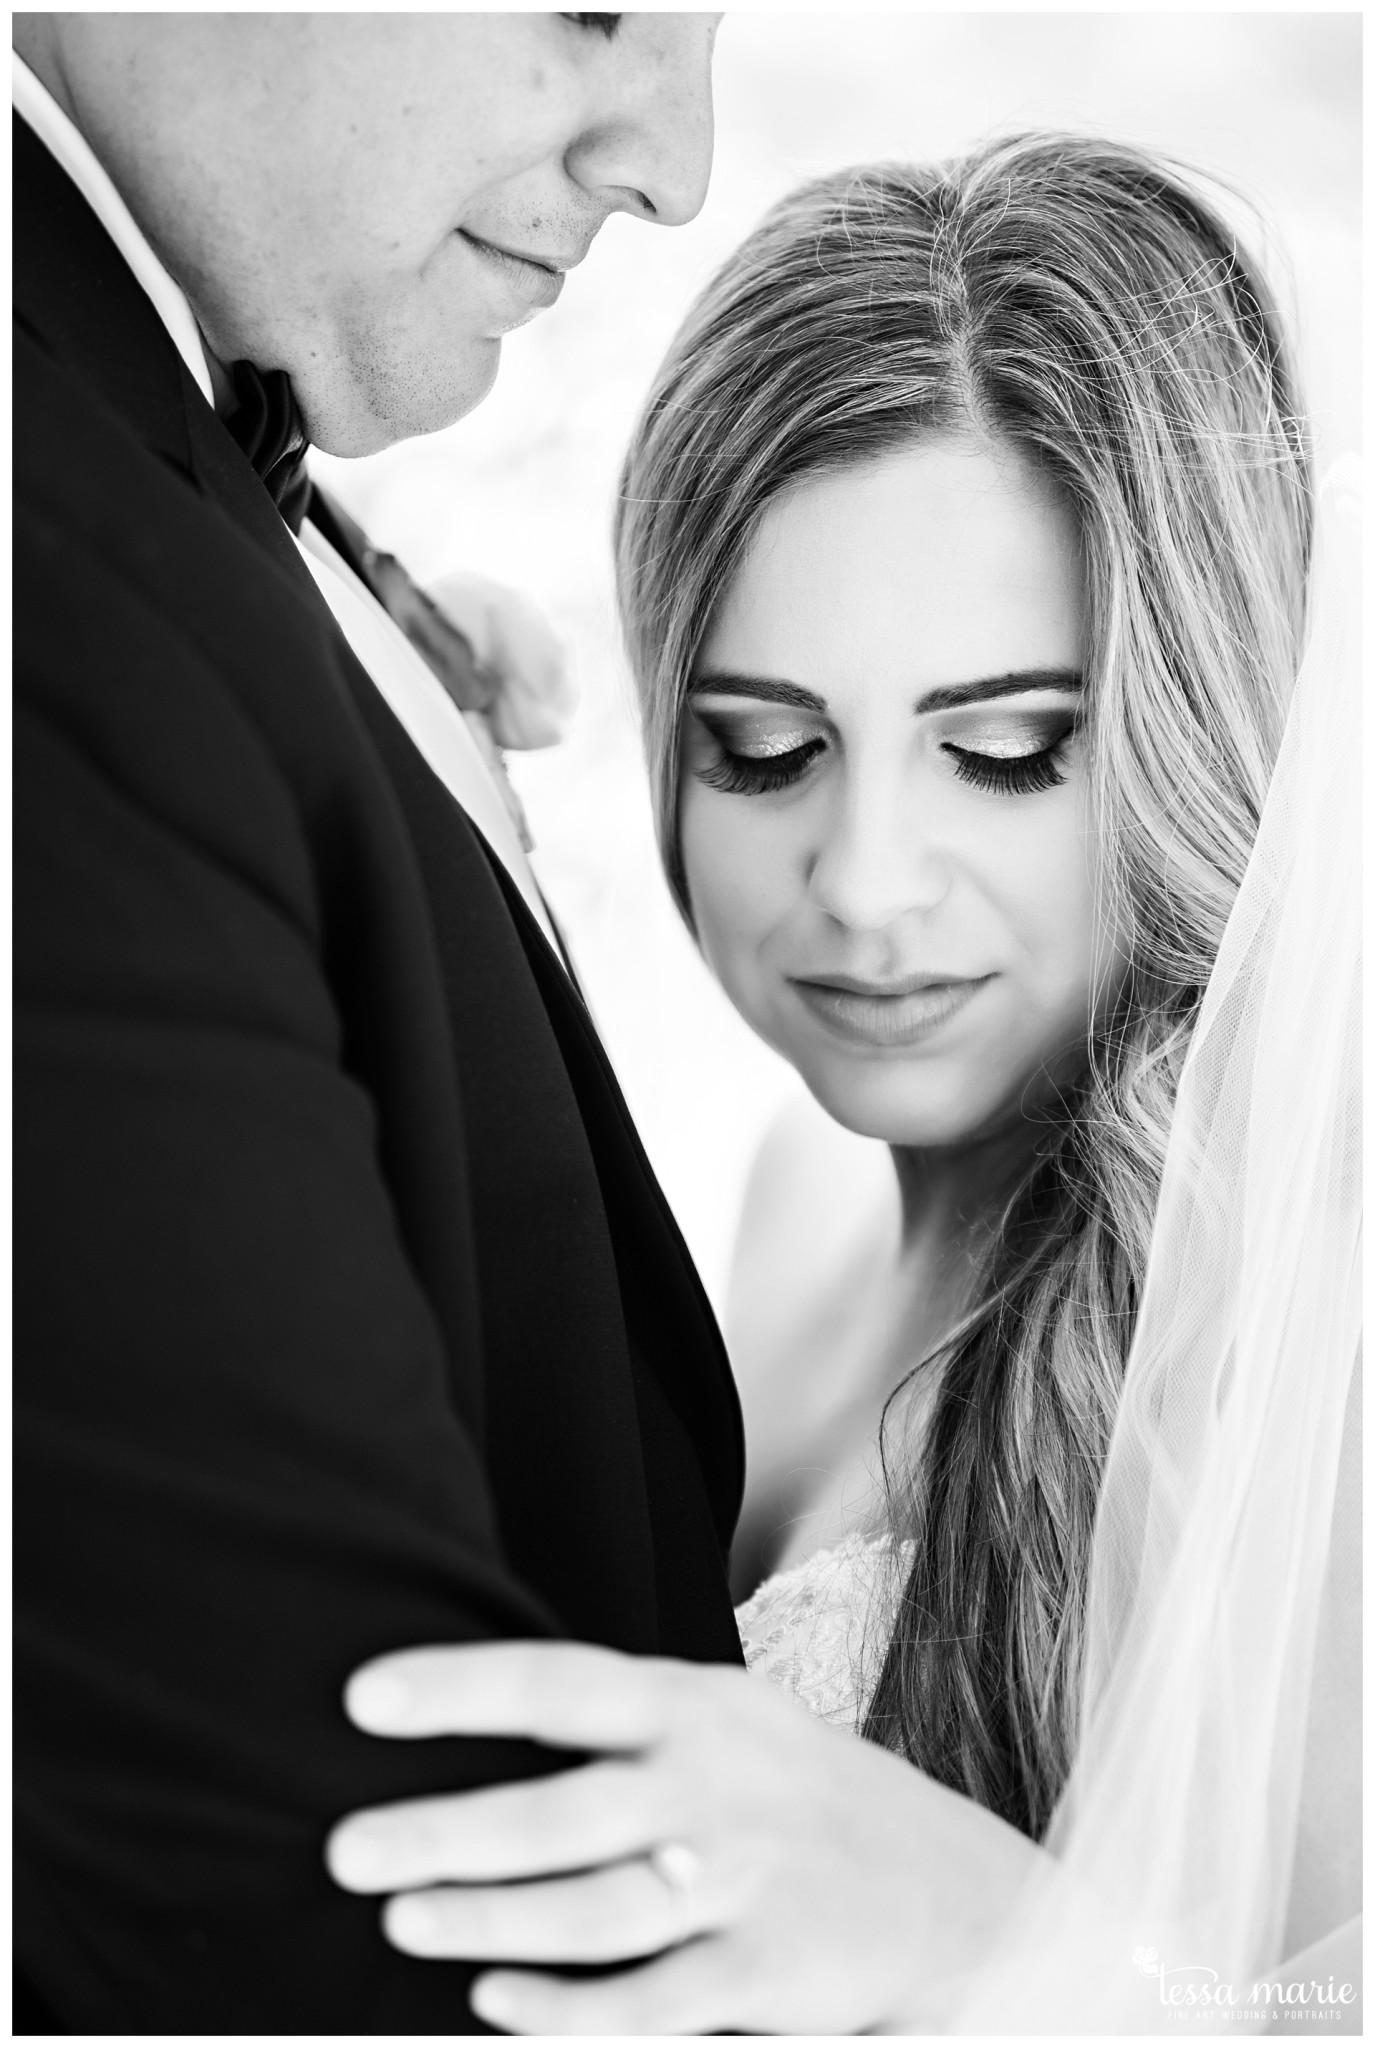 tessa_marie_weddings_legacy_story_focused_wedding_pictures_atlanta_wedding_photographer_0095